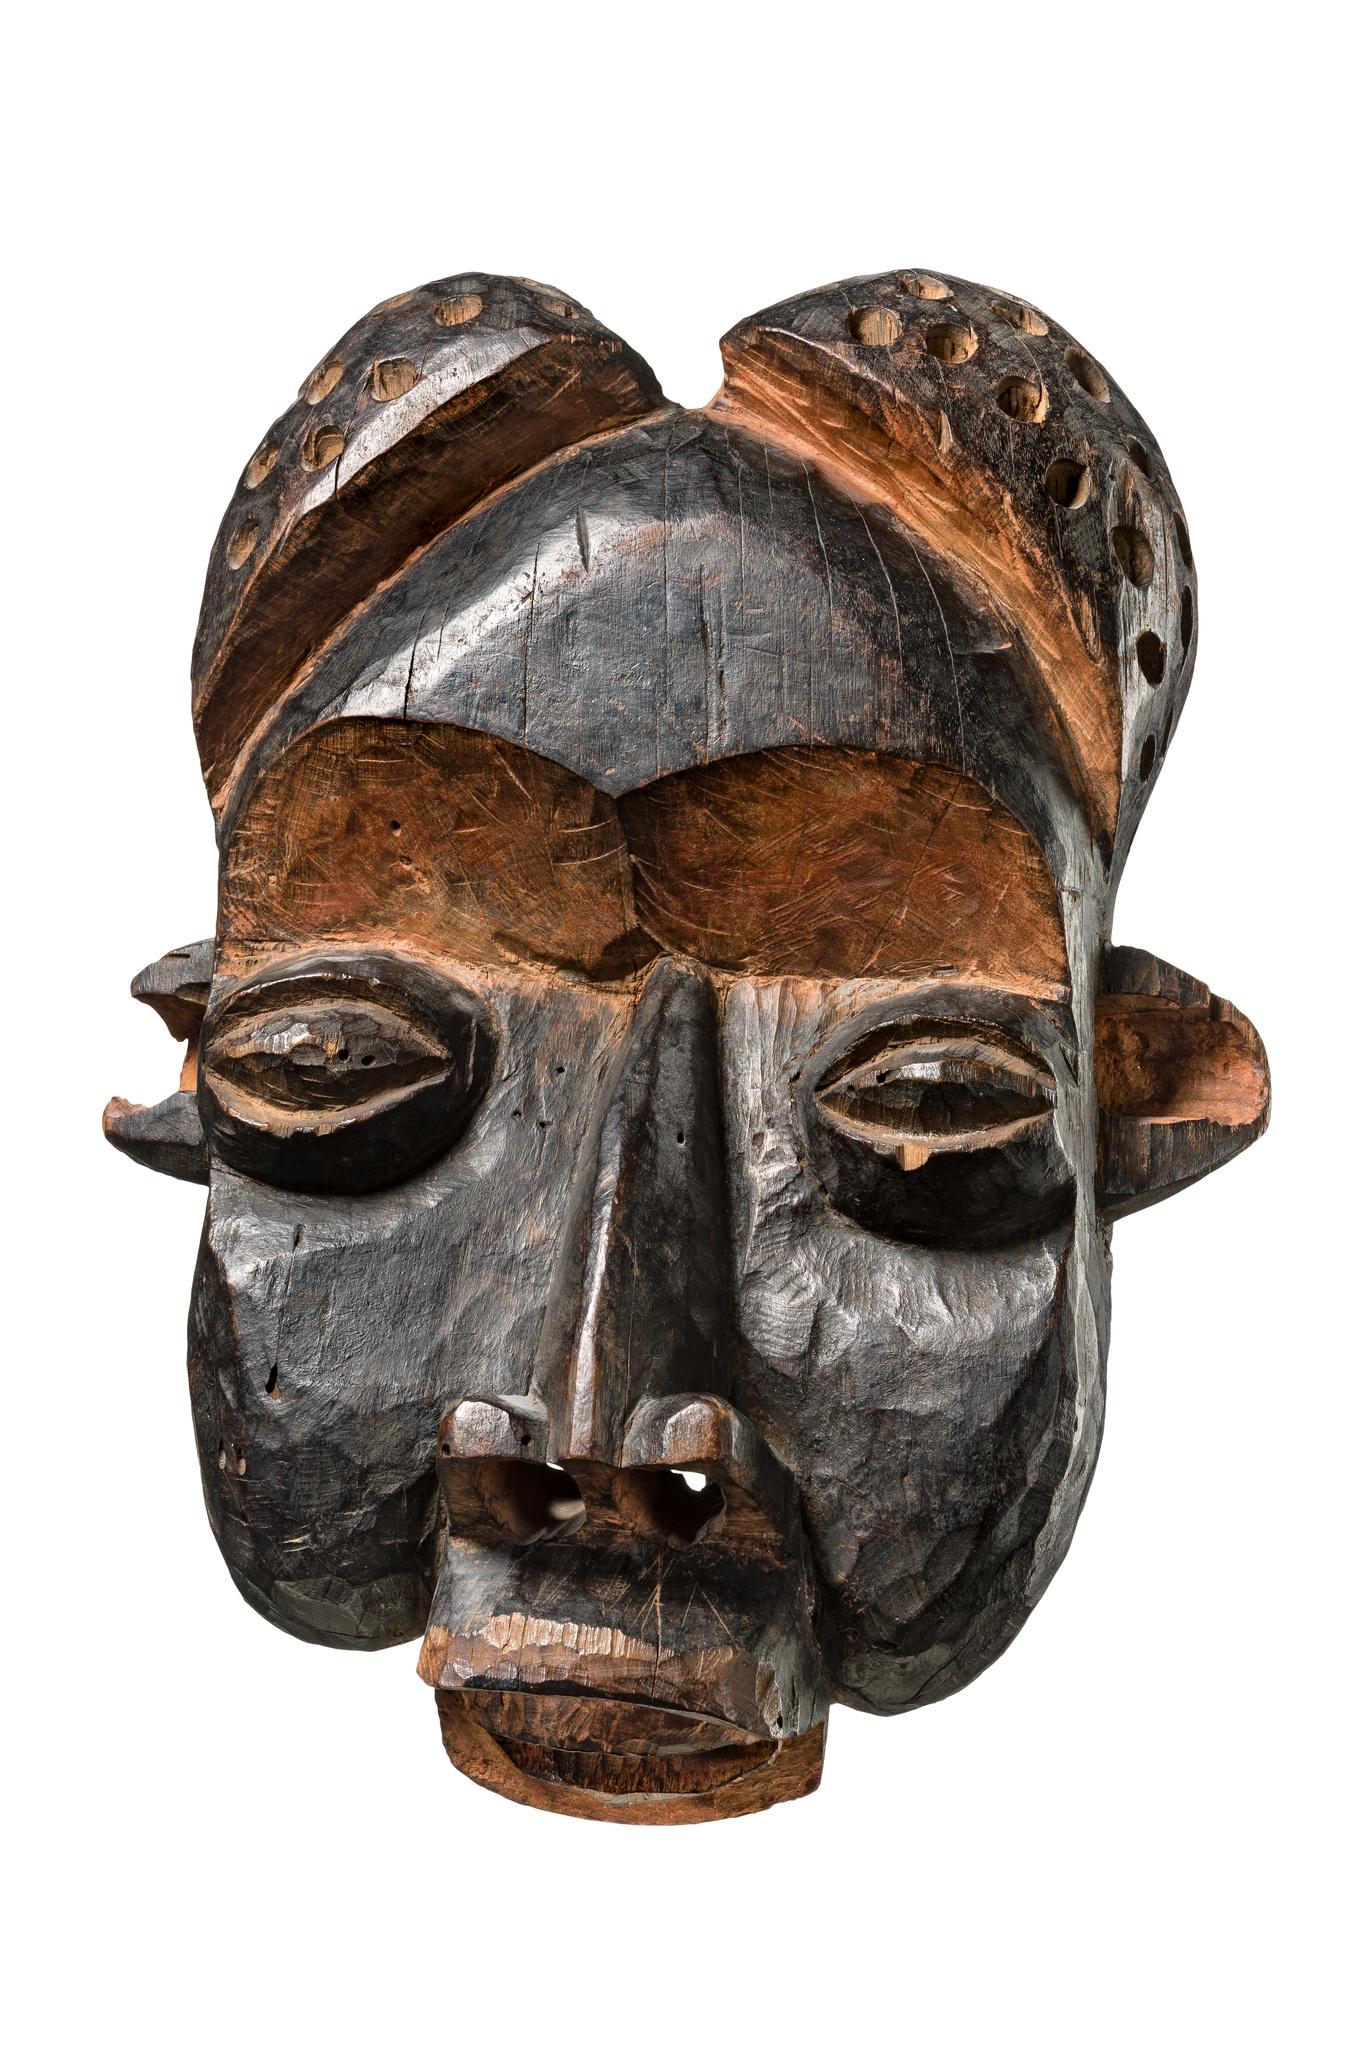 Anthropomorphic mask